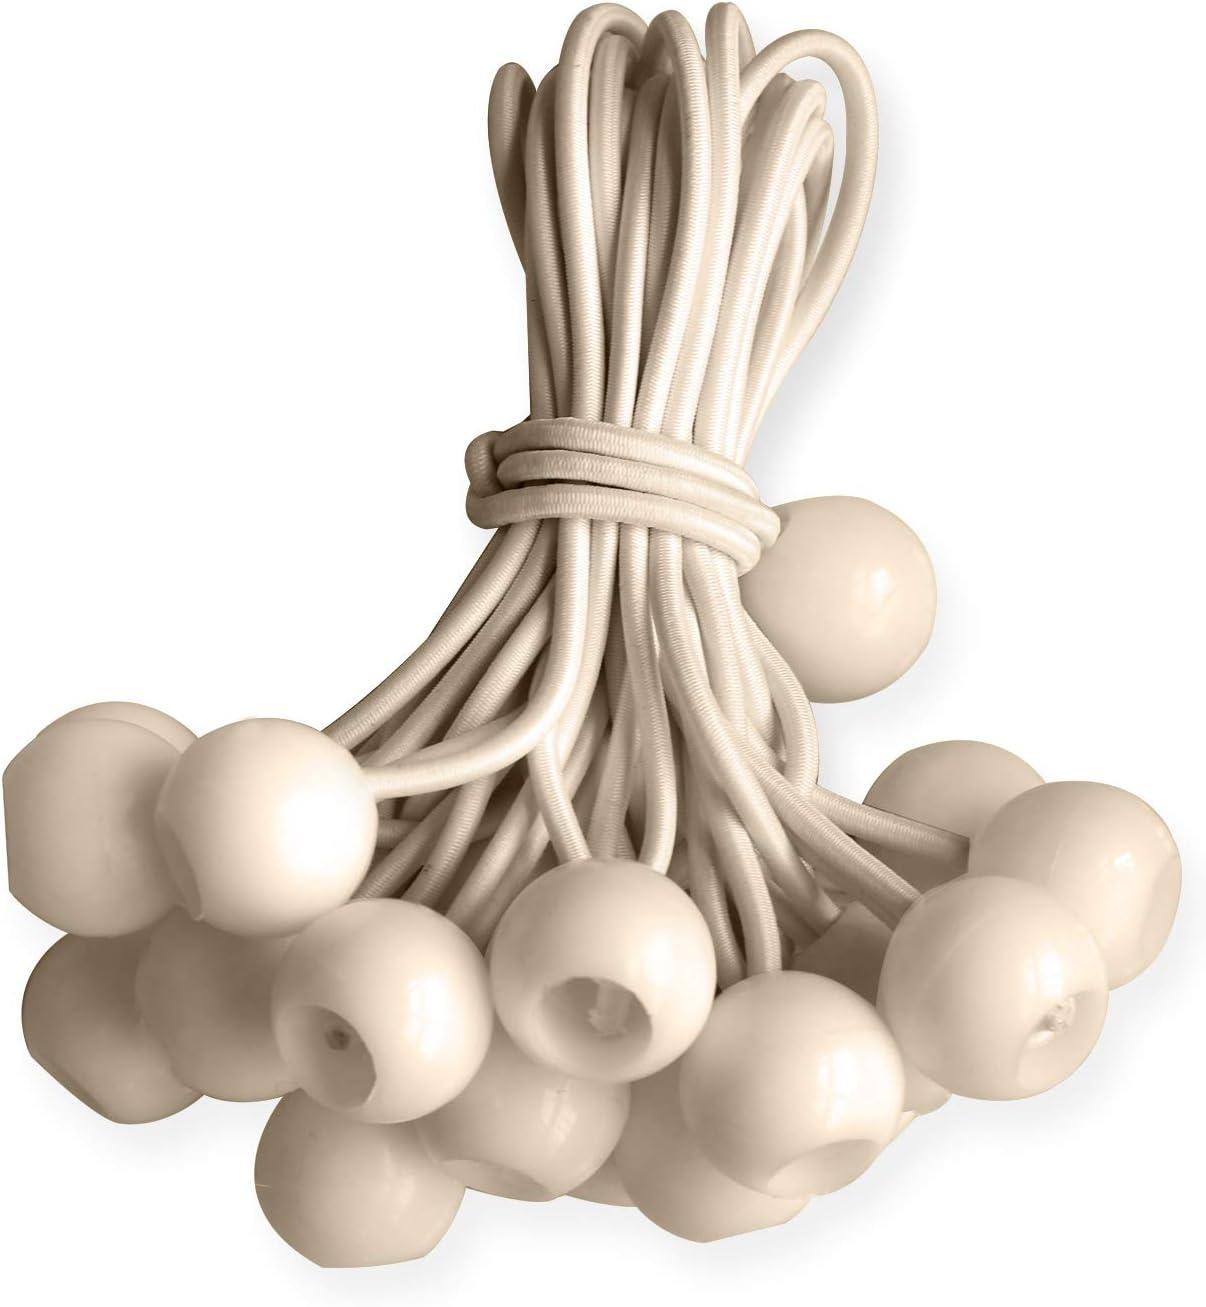 ABCCANOPY Heavy Duty Ball Bungee Canopy Tarp Tie Down Cord Elastic String Ball Bungee tarp Ball Ties 9 Beige 25pcs